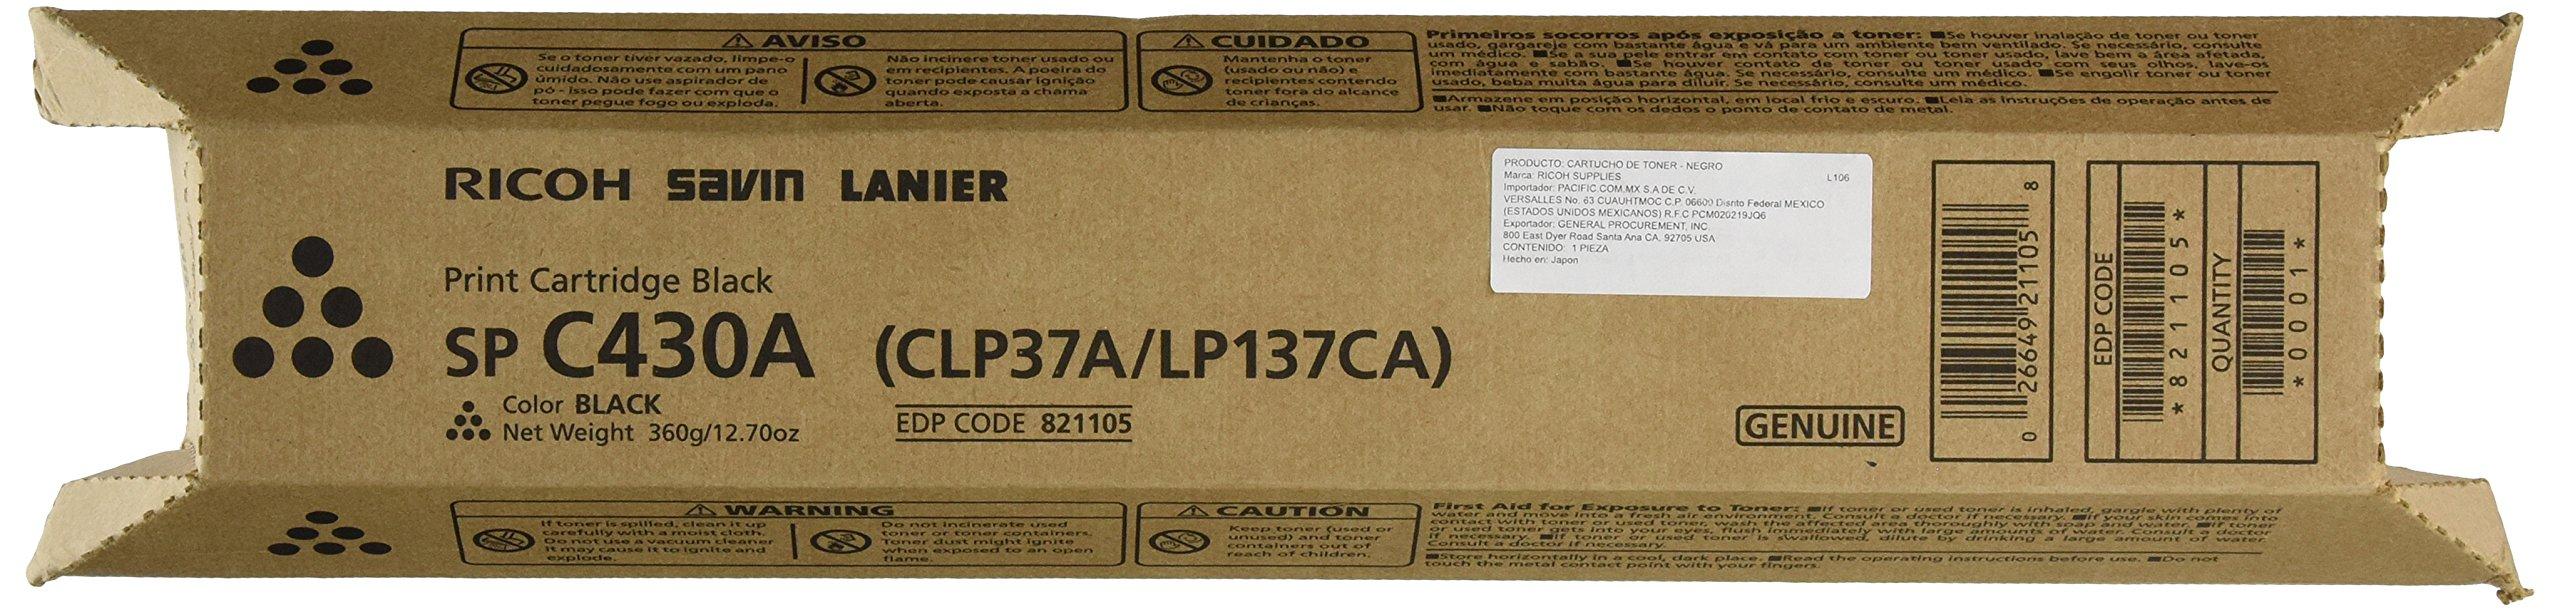 Ricoh Black Toner Cartridge, 21000 Yield (821105)